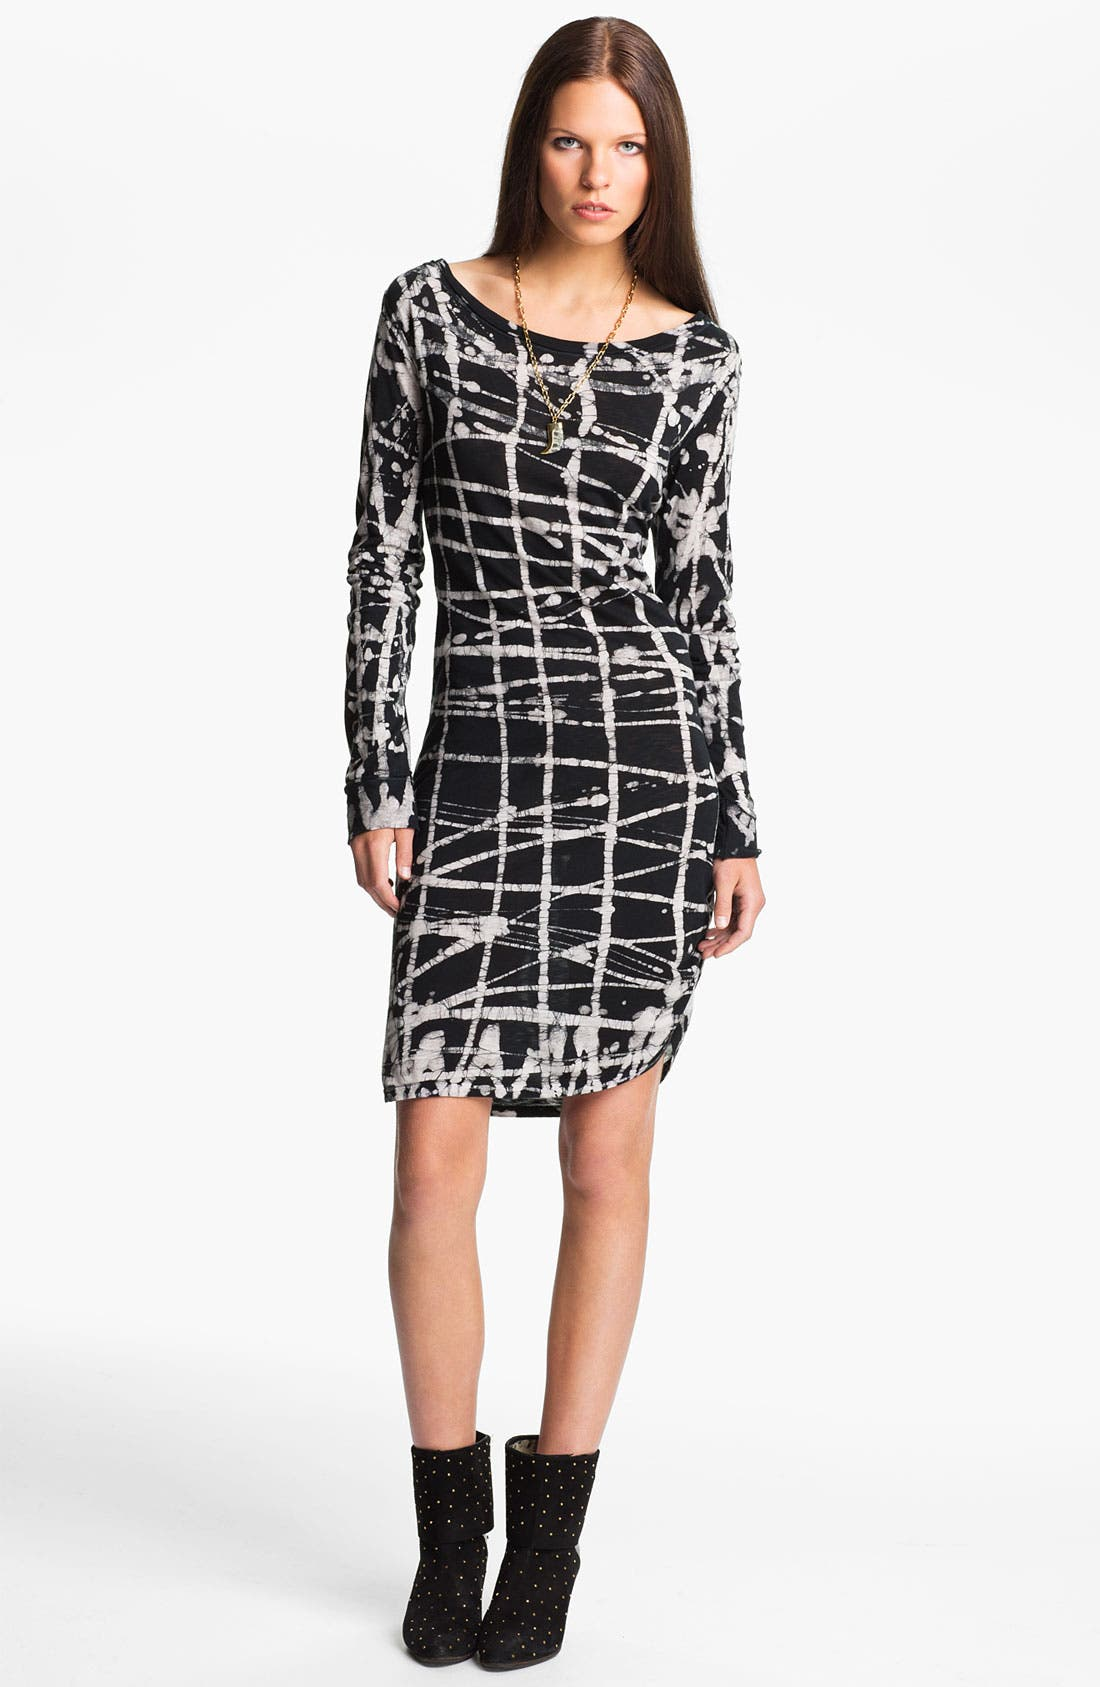 Main Image - Kelly Wearstler 'Batik Cage' Jersey Dress